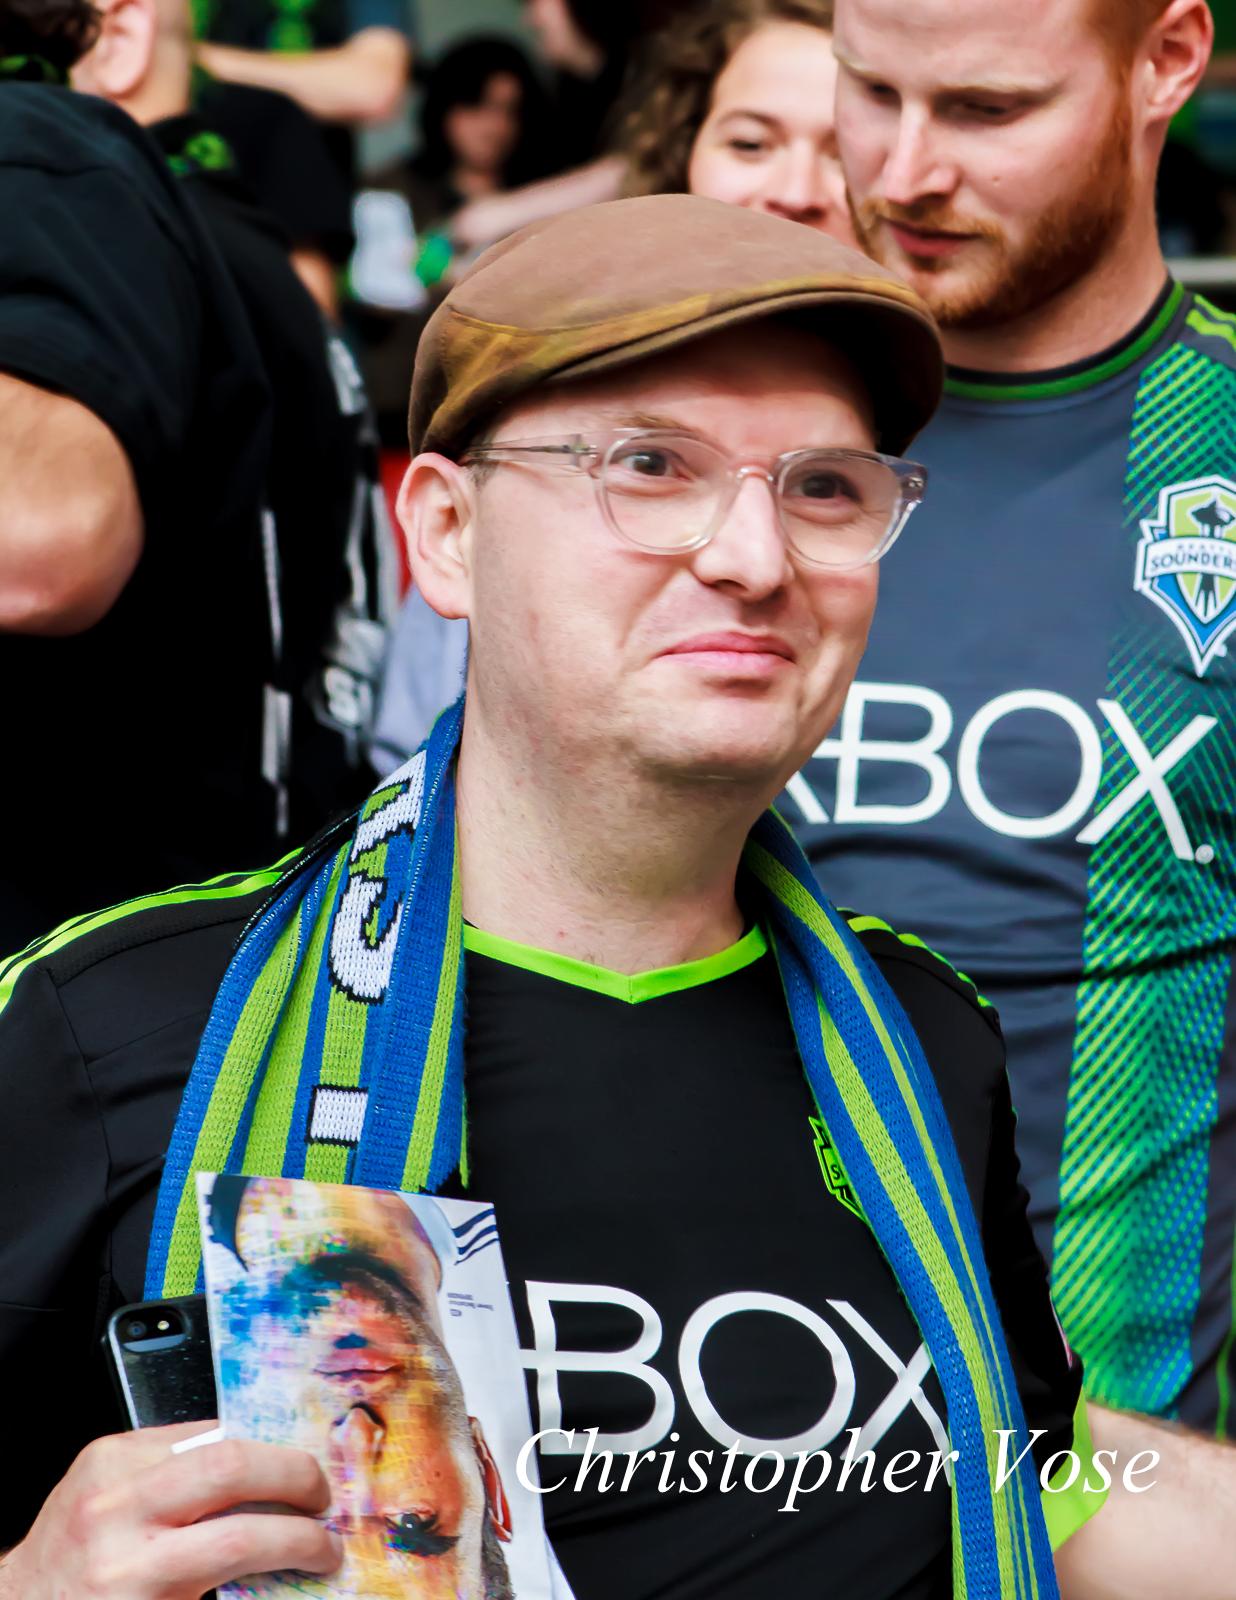 2014-07-05 Emerald City Supporter.jpg